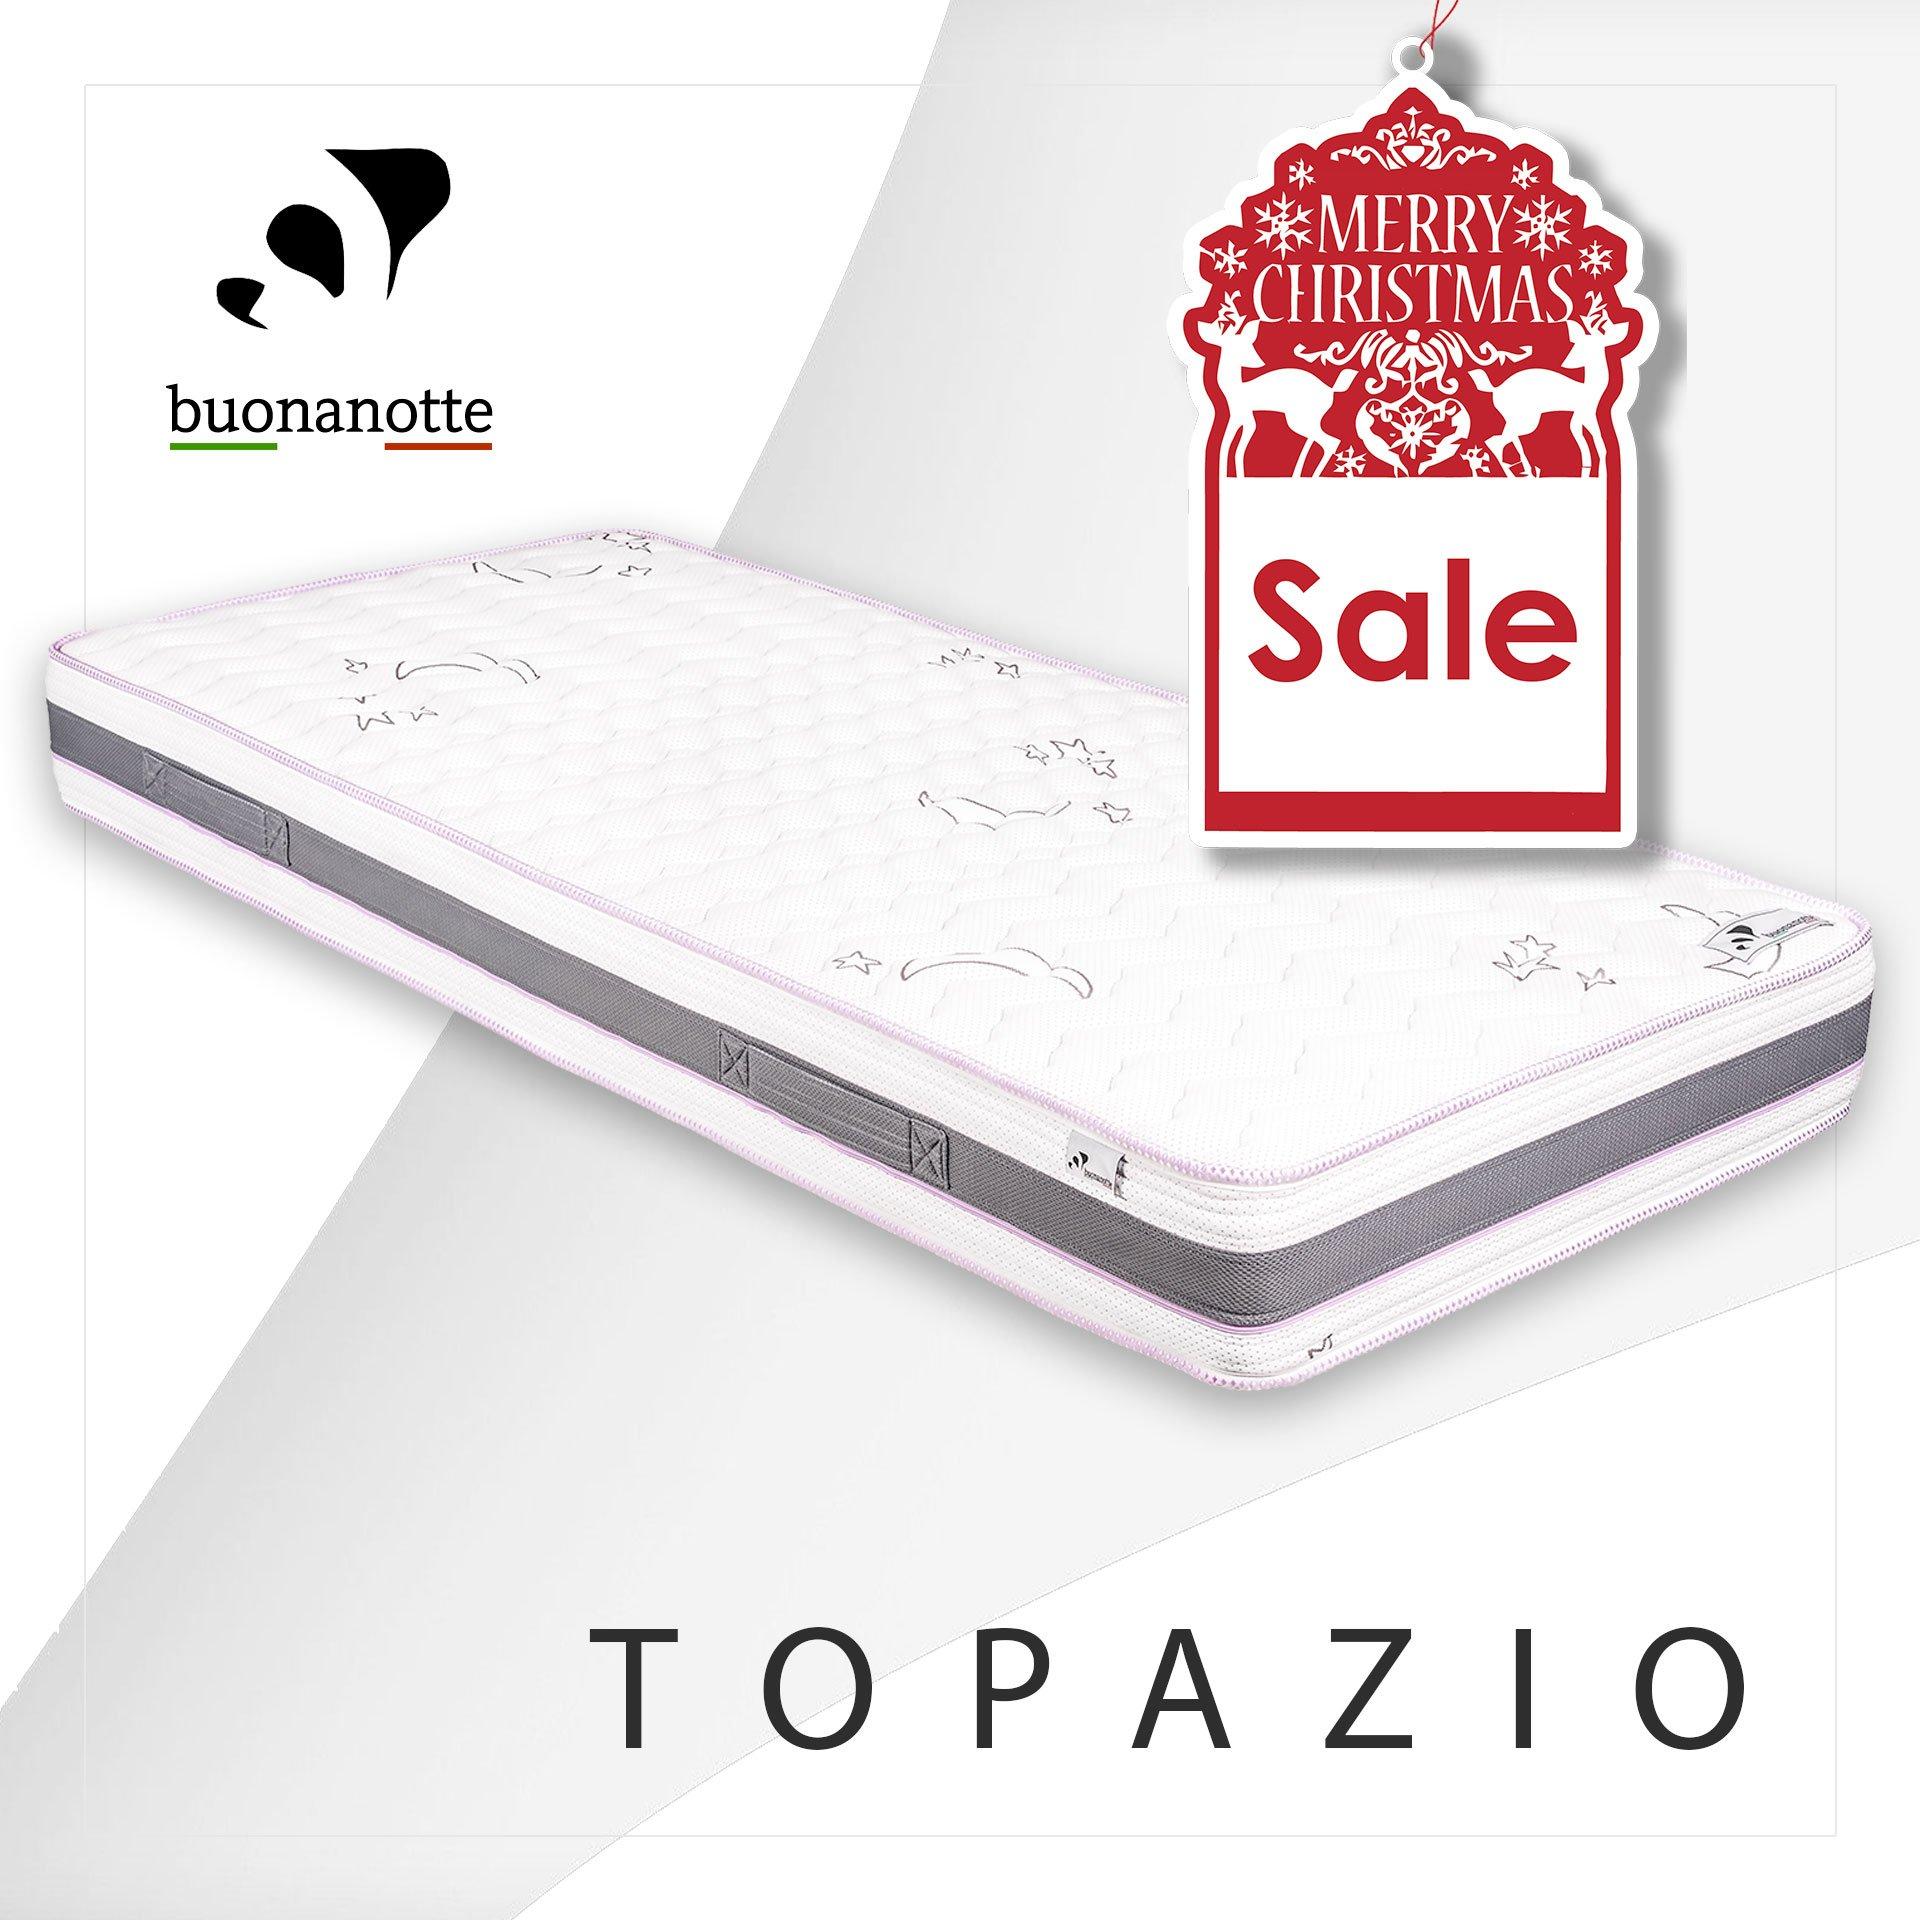 topazio-epg